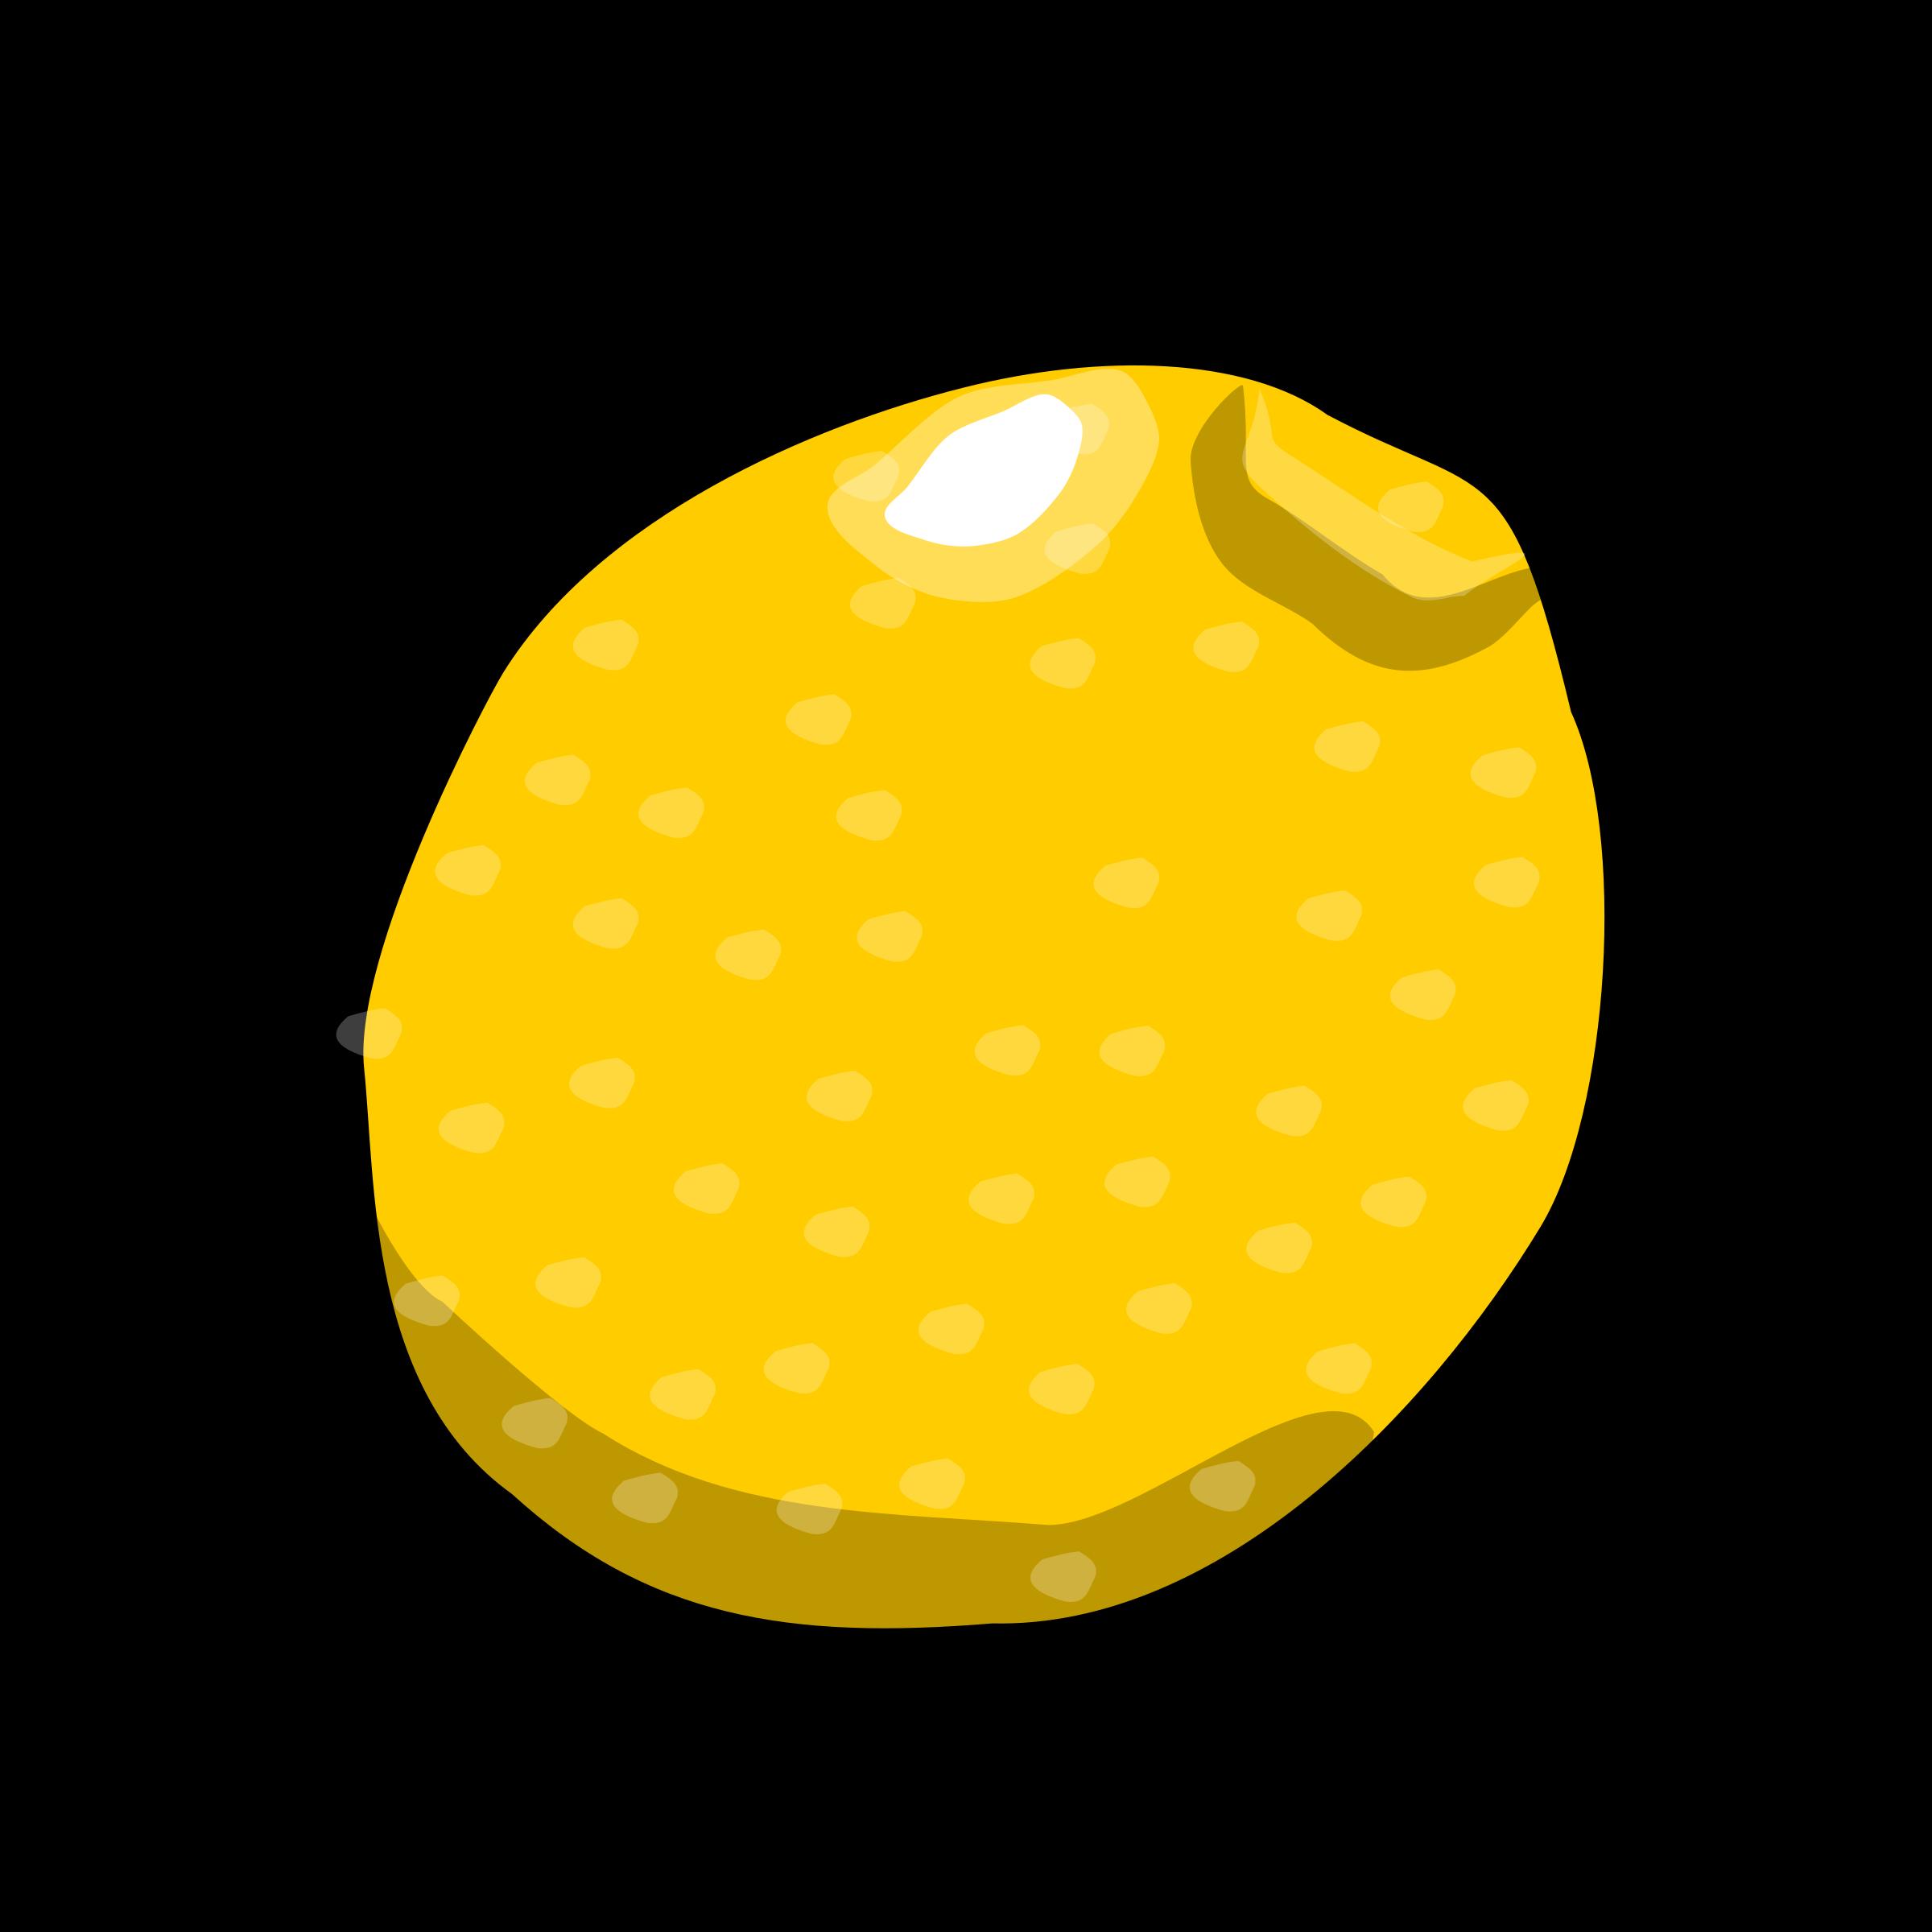 vector free Lemons clipart lemon fruit. Big image png.